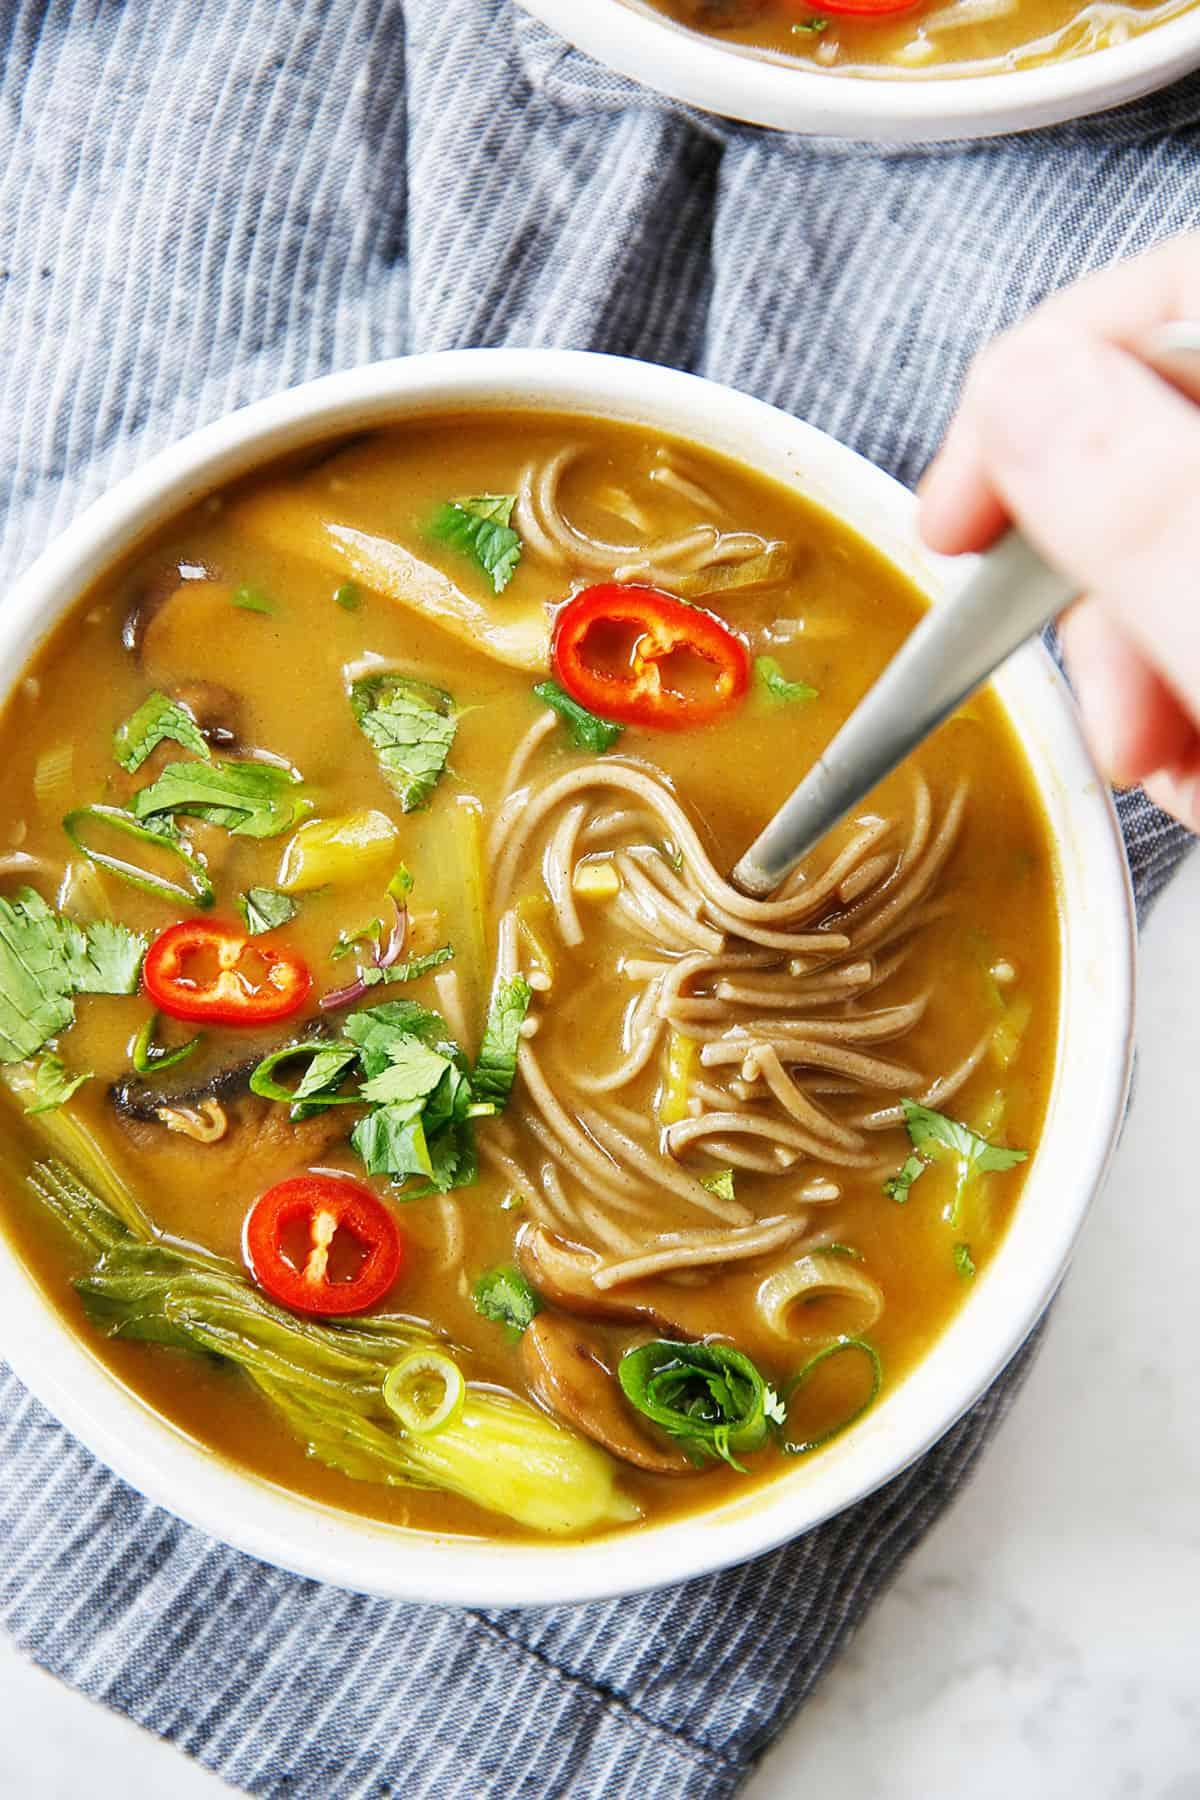 A bowl of spicy noodle soup.